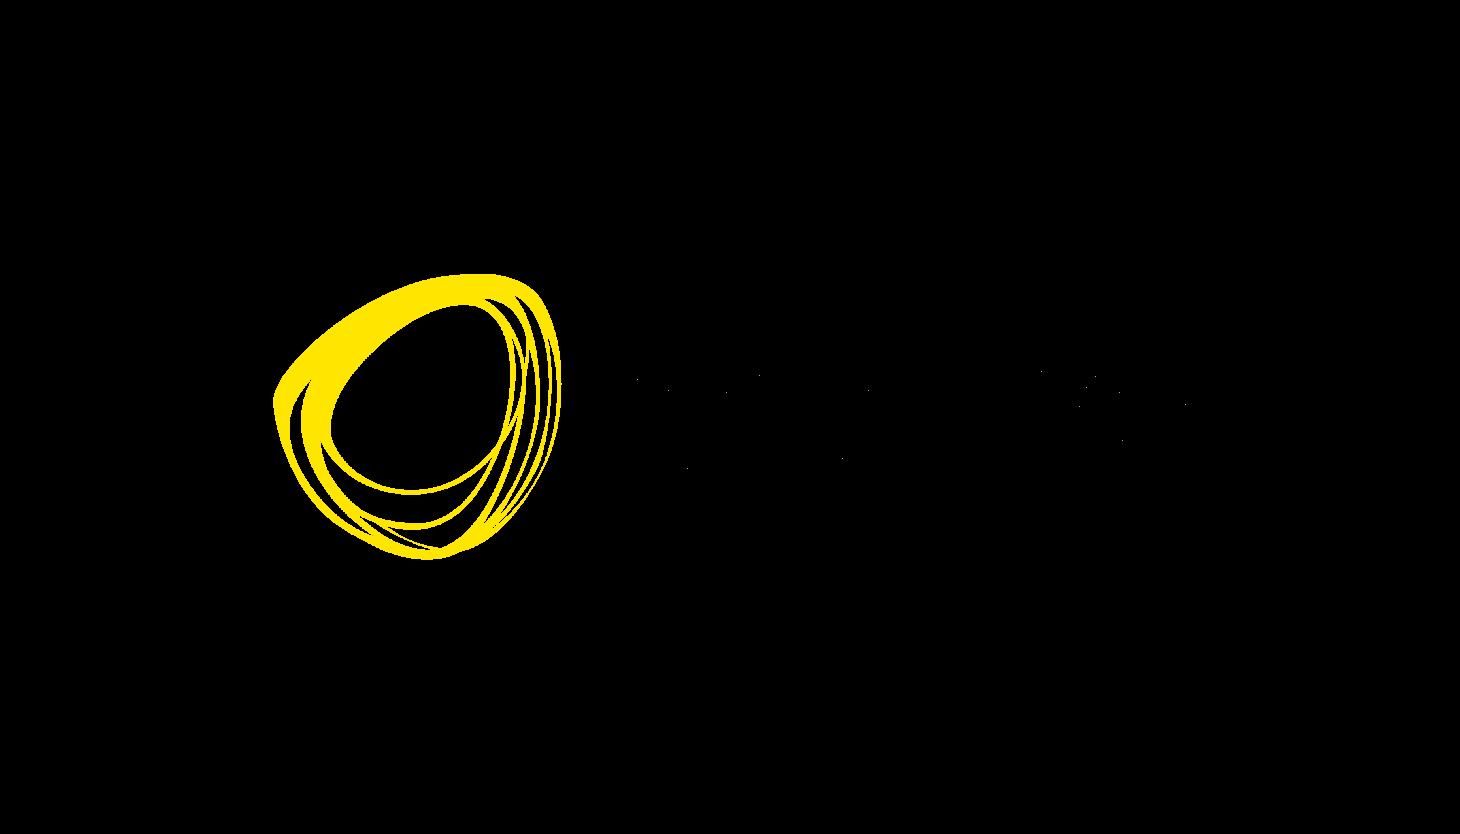 DevonWay-Logos-Scroller-Orano